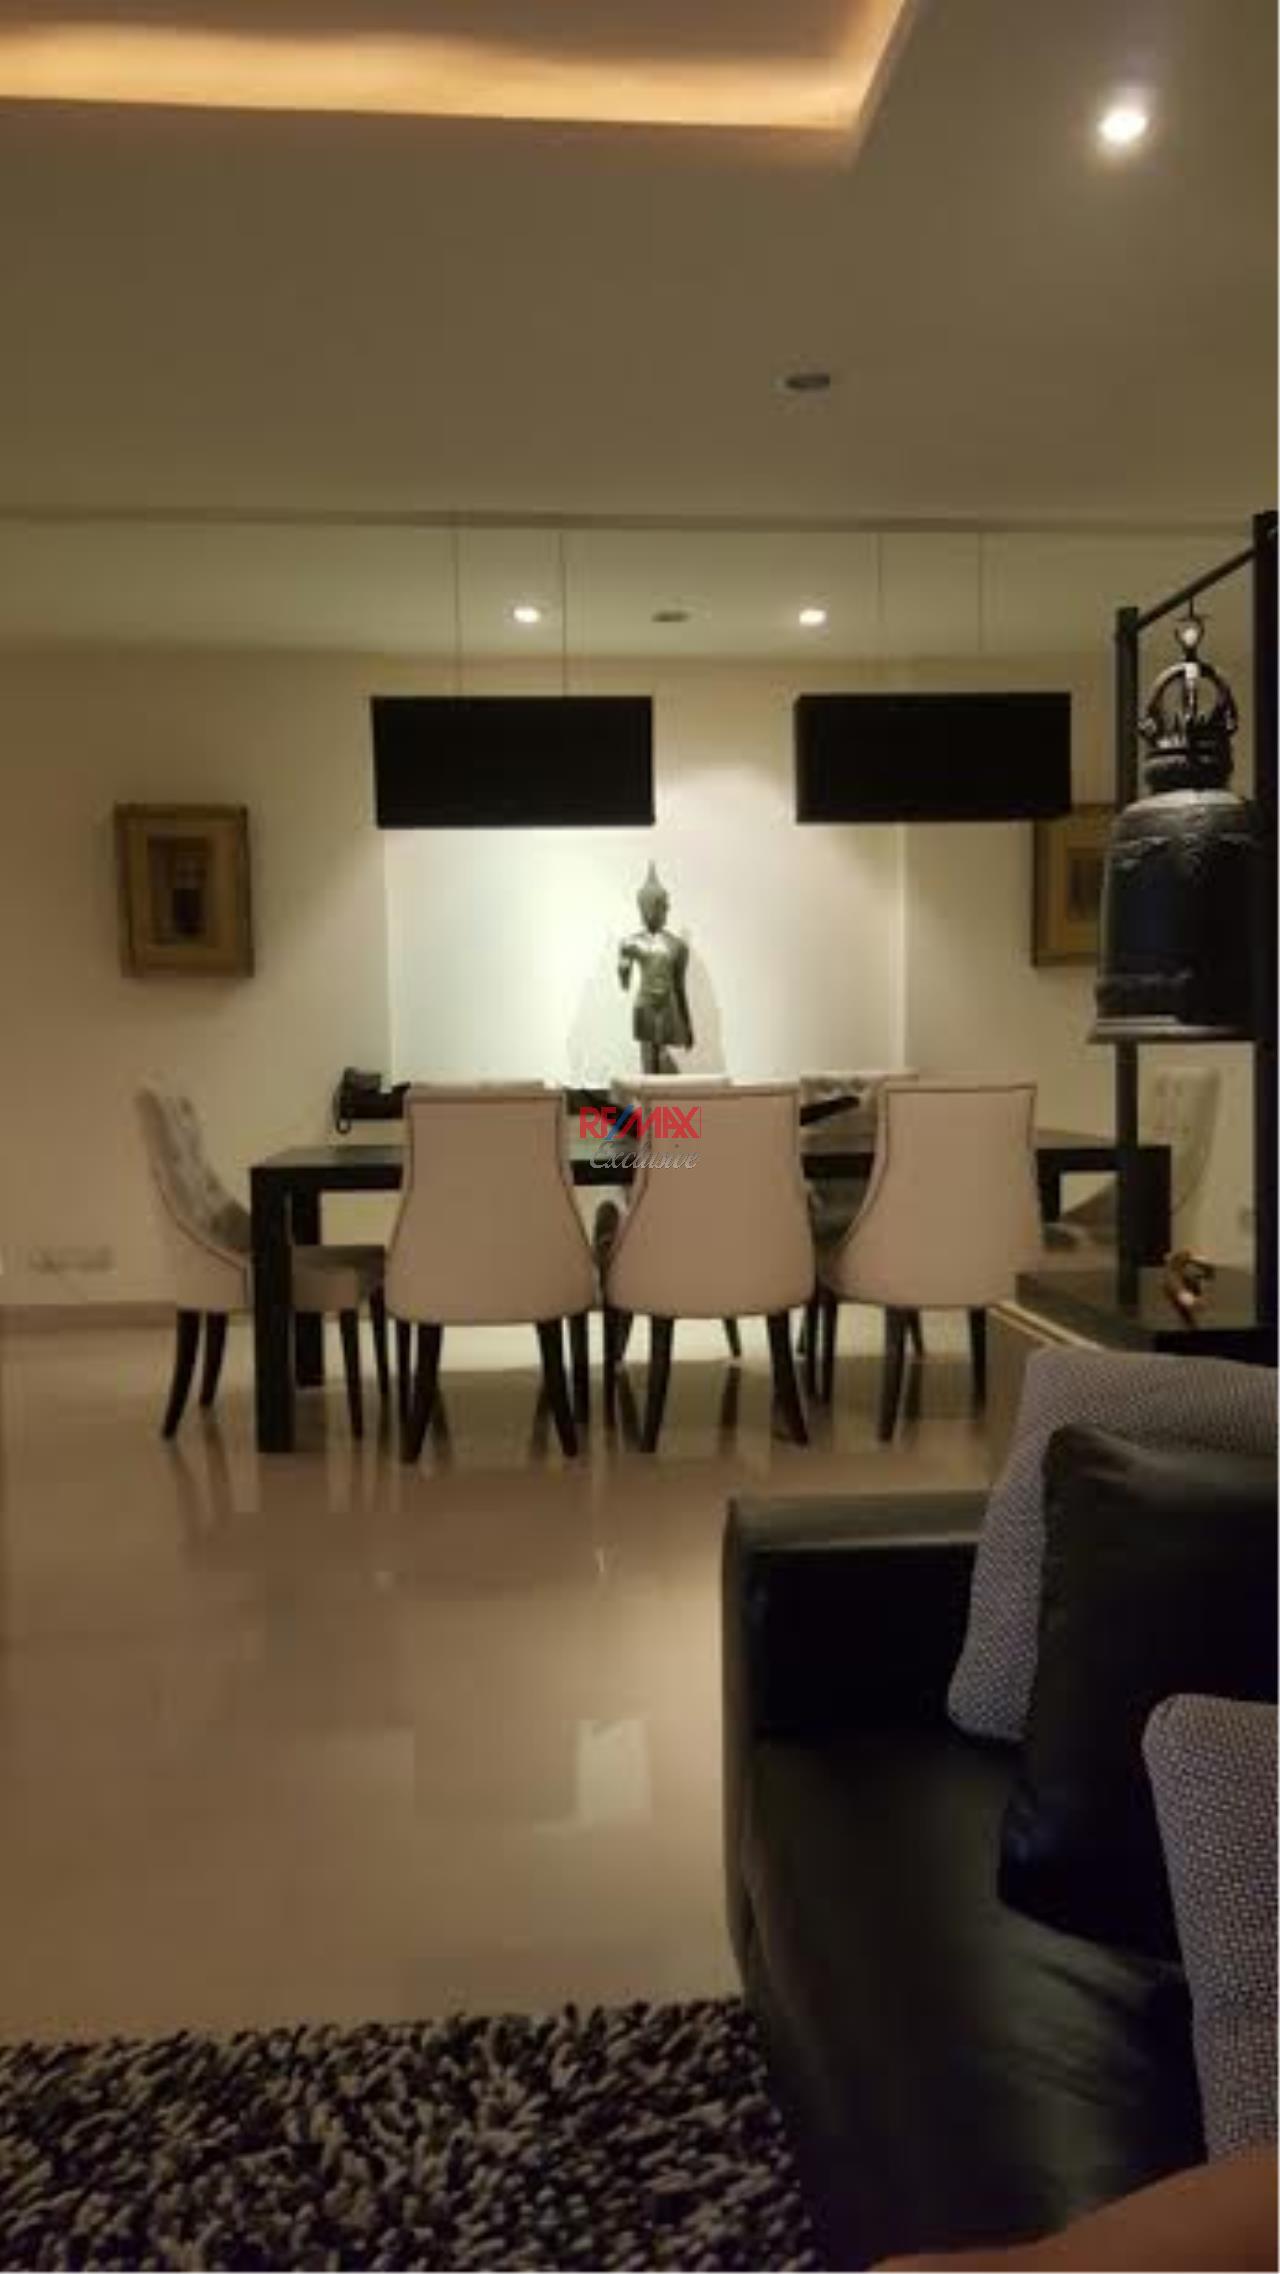 RE/MAX Exclusive Agency's Watermark Chaophraya Condominium, 4 bedrooms, 4 bathrooms, For Sale 47,500,000 THB 5